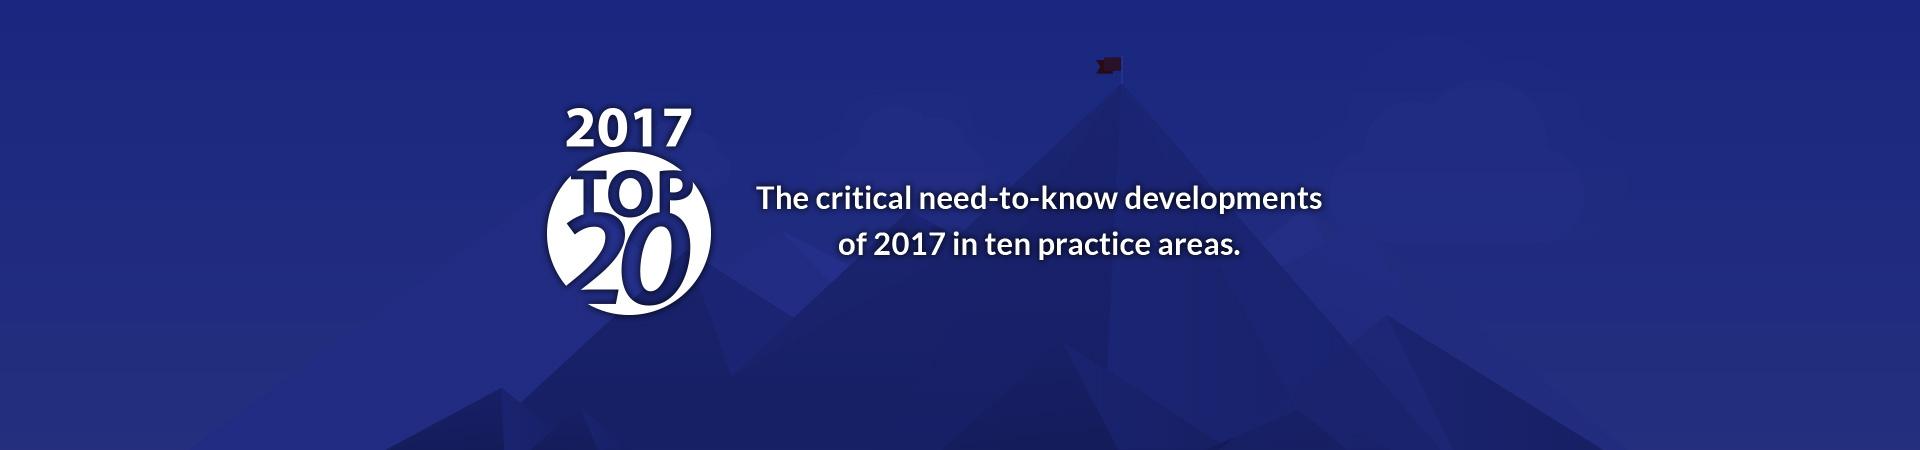 CEB's 2017 Top 20